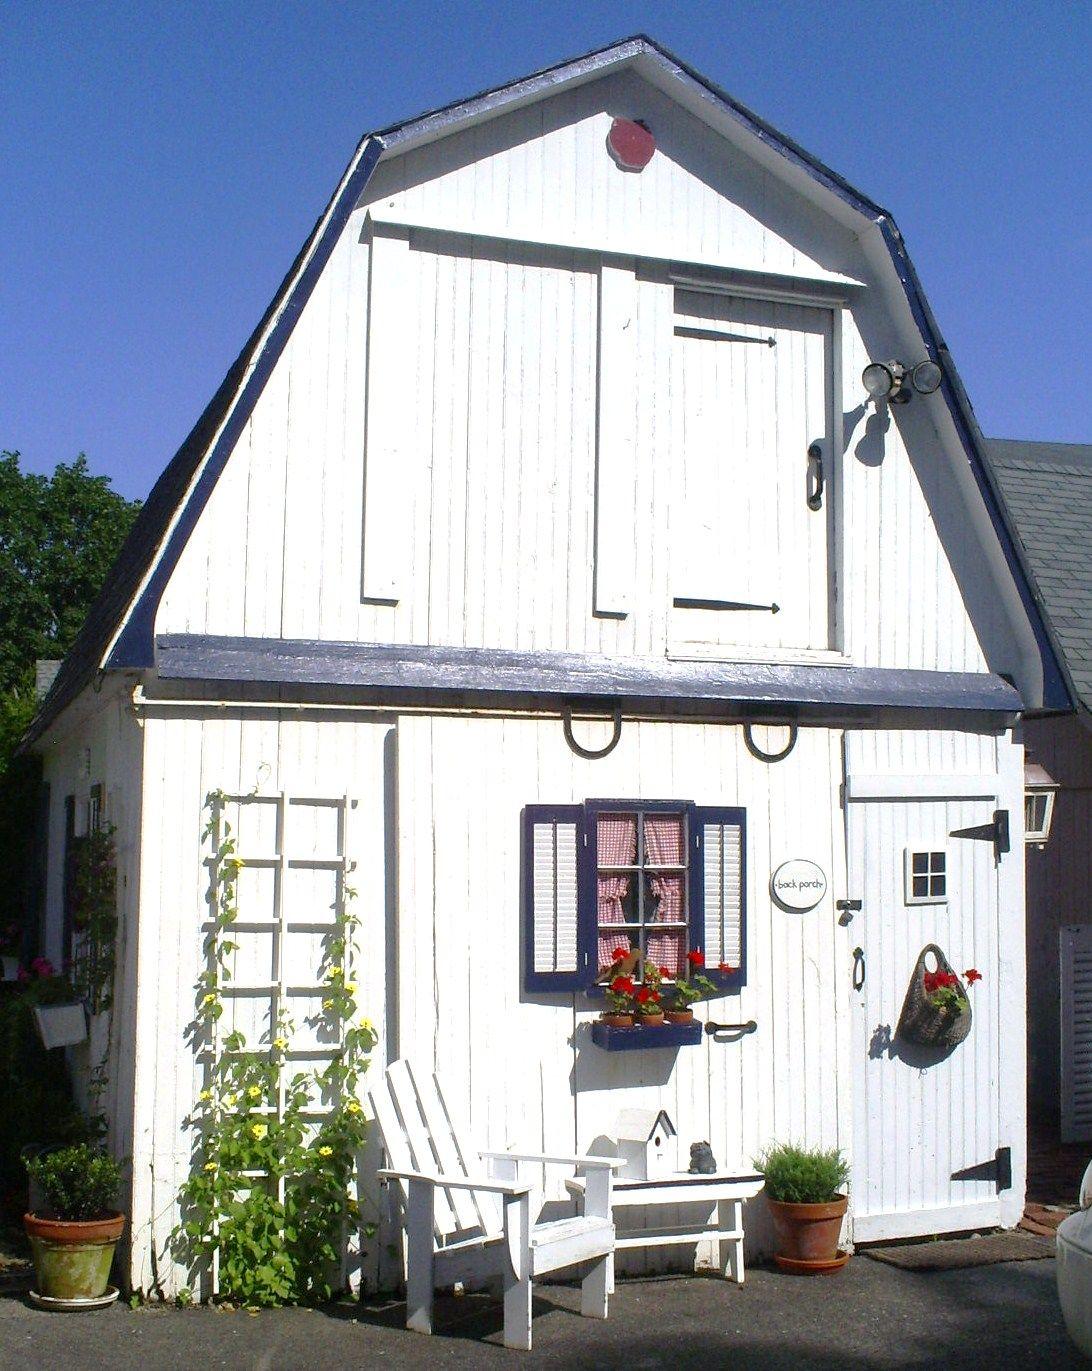 our carraige house workshop